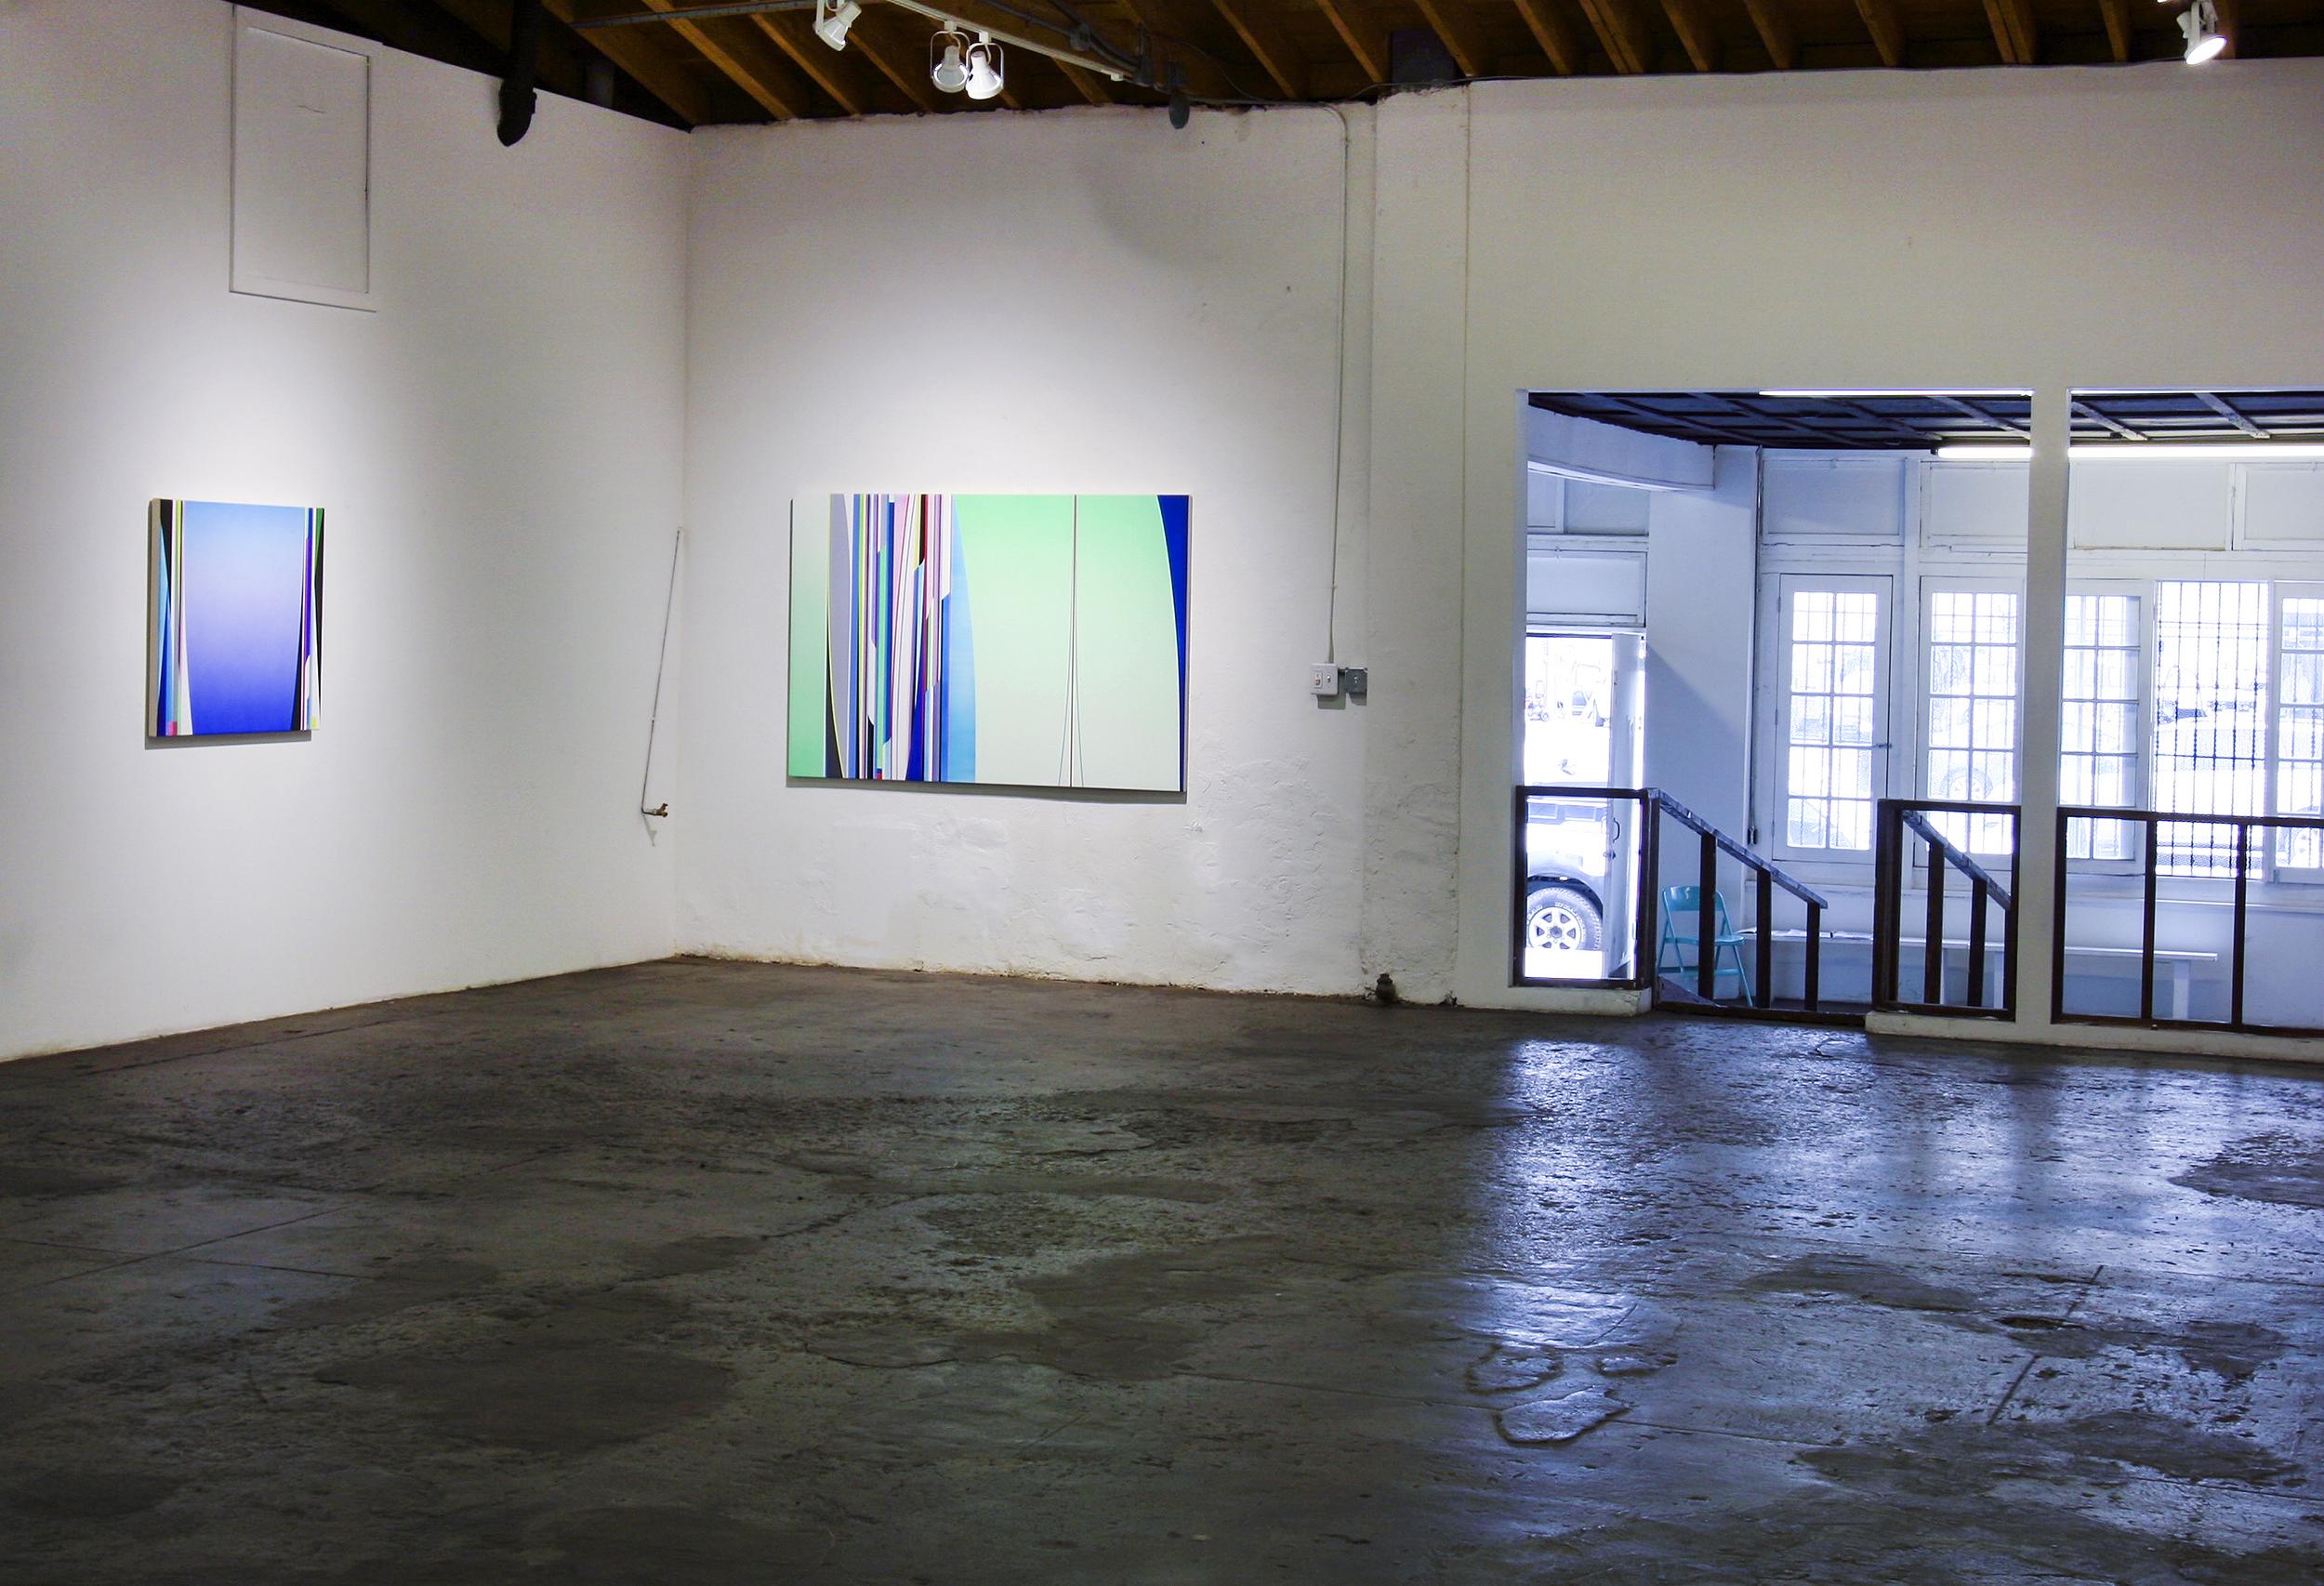 Left to Right: Dion Johnson, 2017: Zero Gravity, 3 x 36 inches; Terraformation, 48 x 72 inches